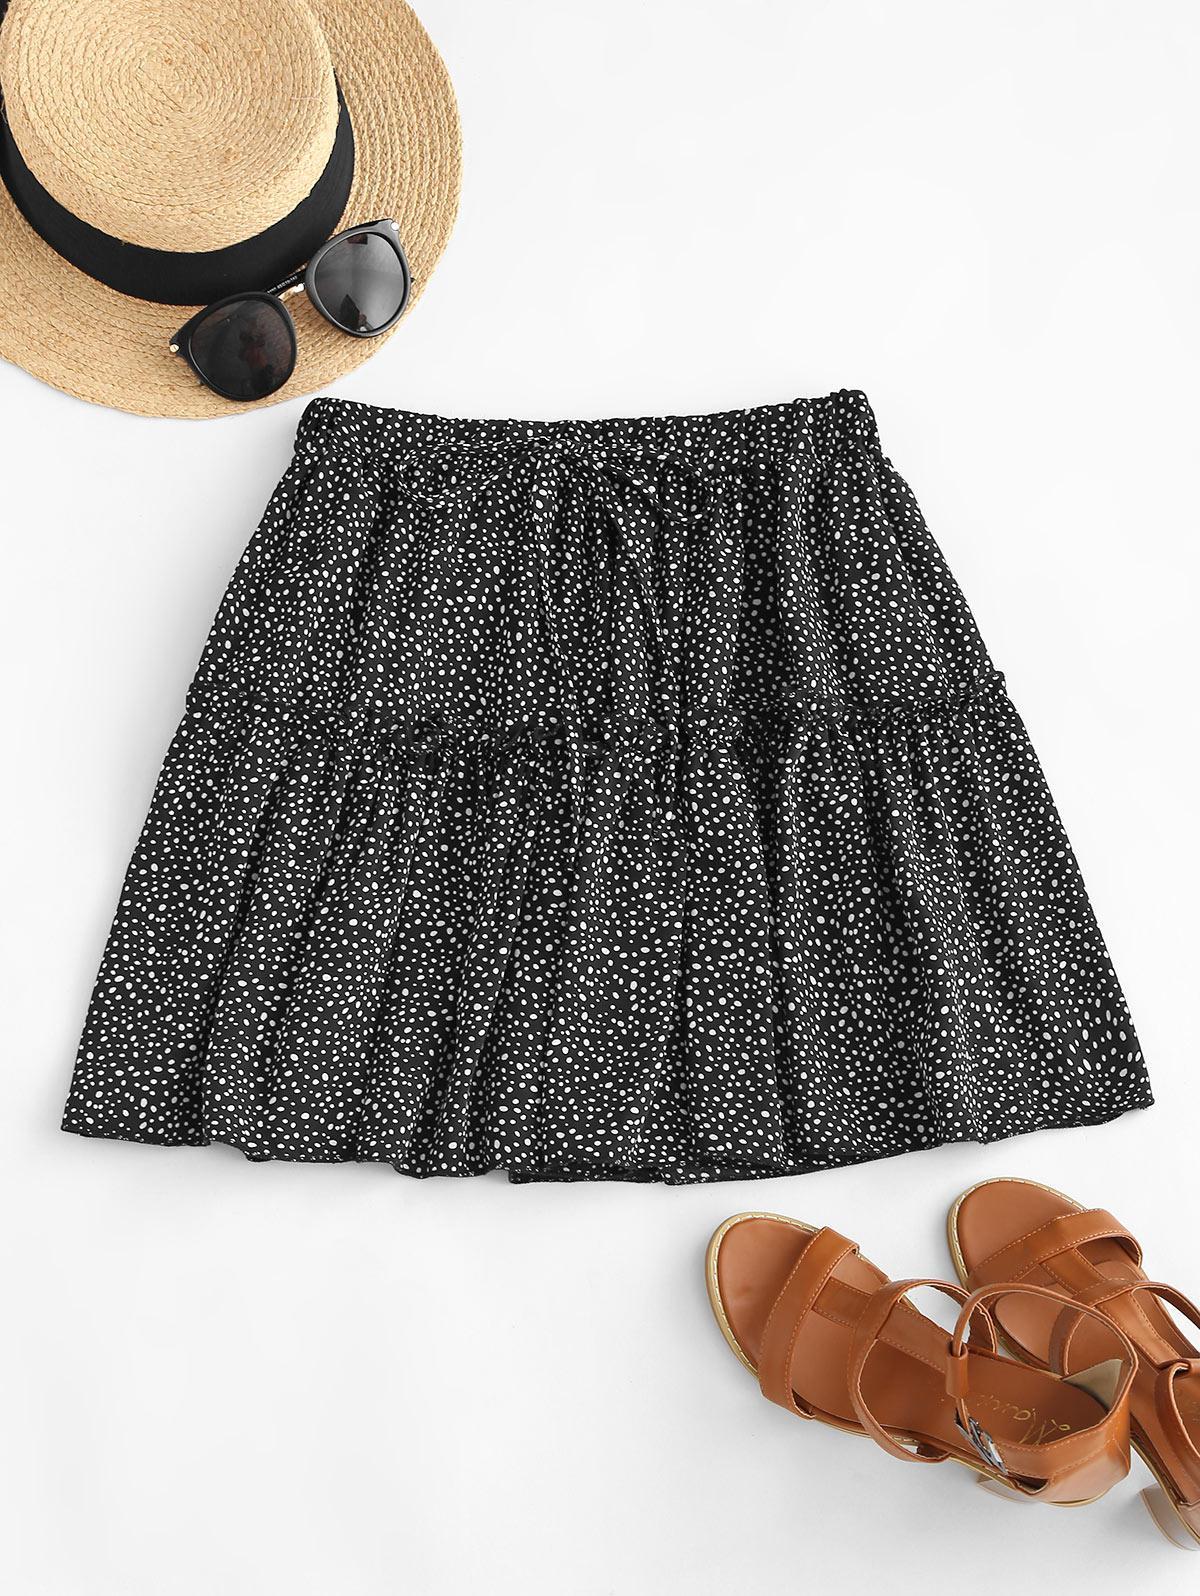 Dalmatian Print Tiered Skirt